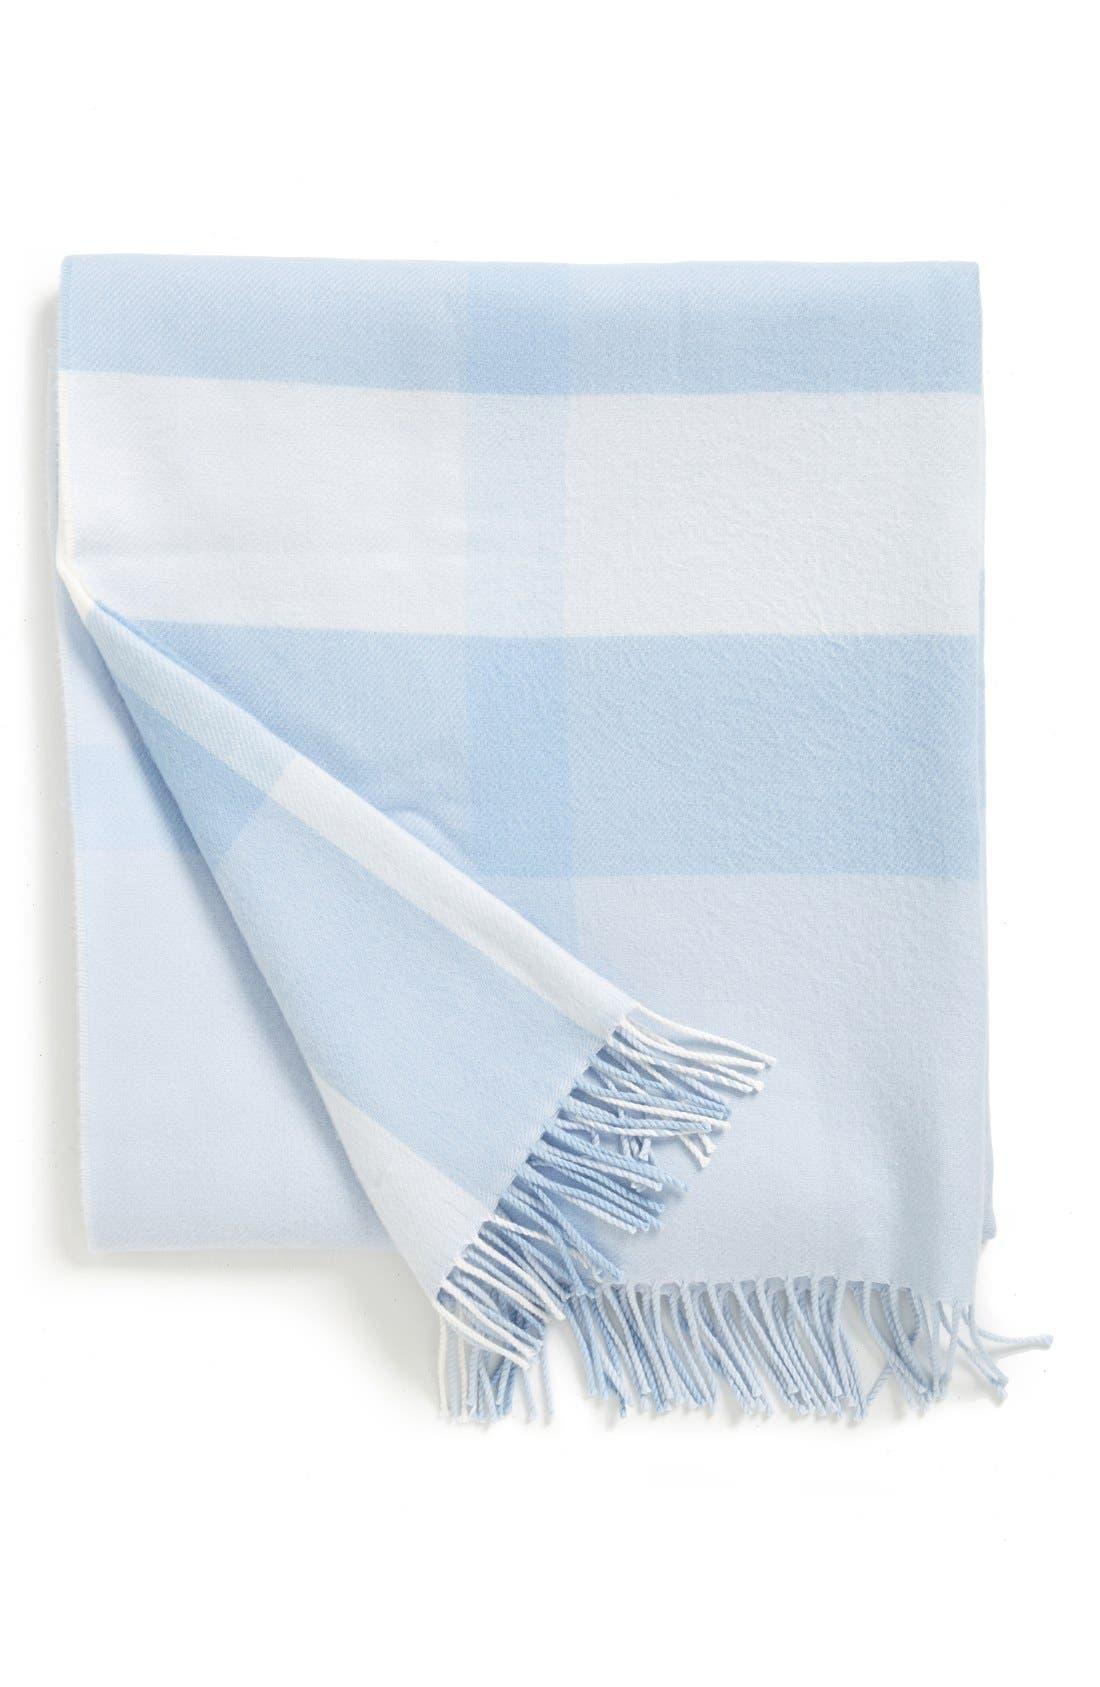 Burberry Merino Wool Blanket